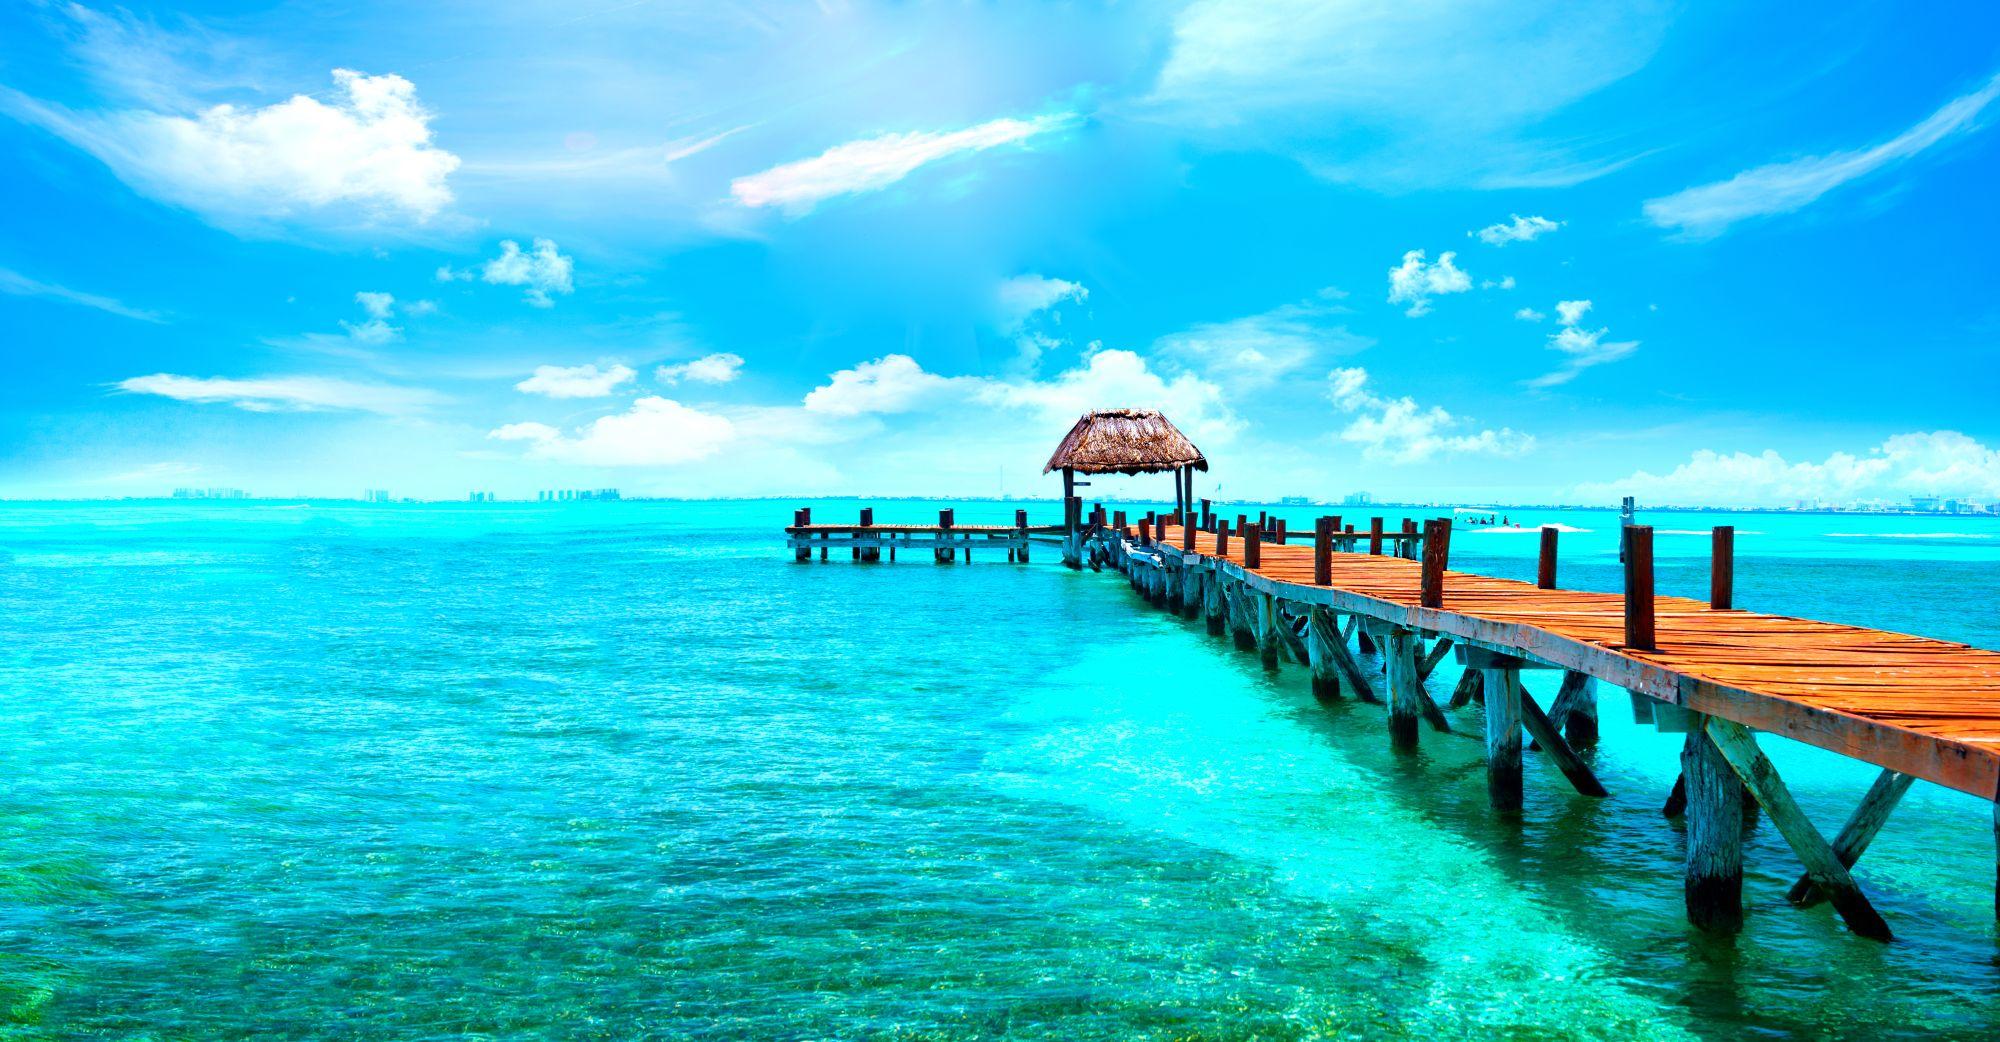 Pomost nad morzem